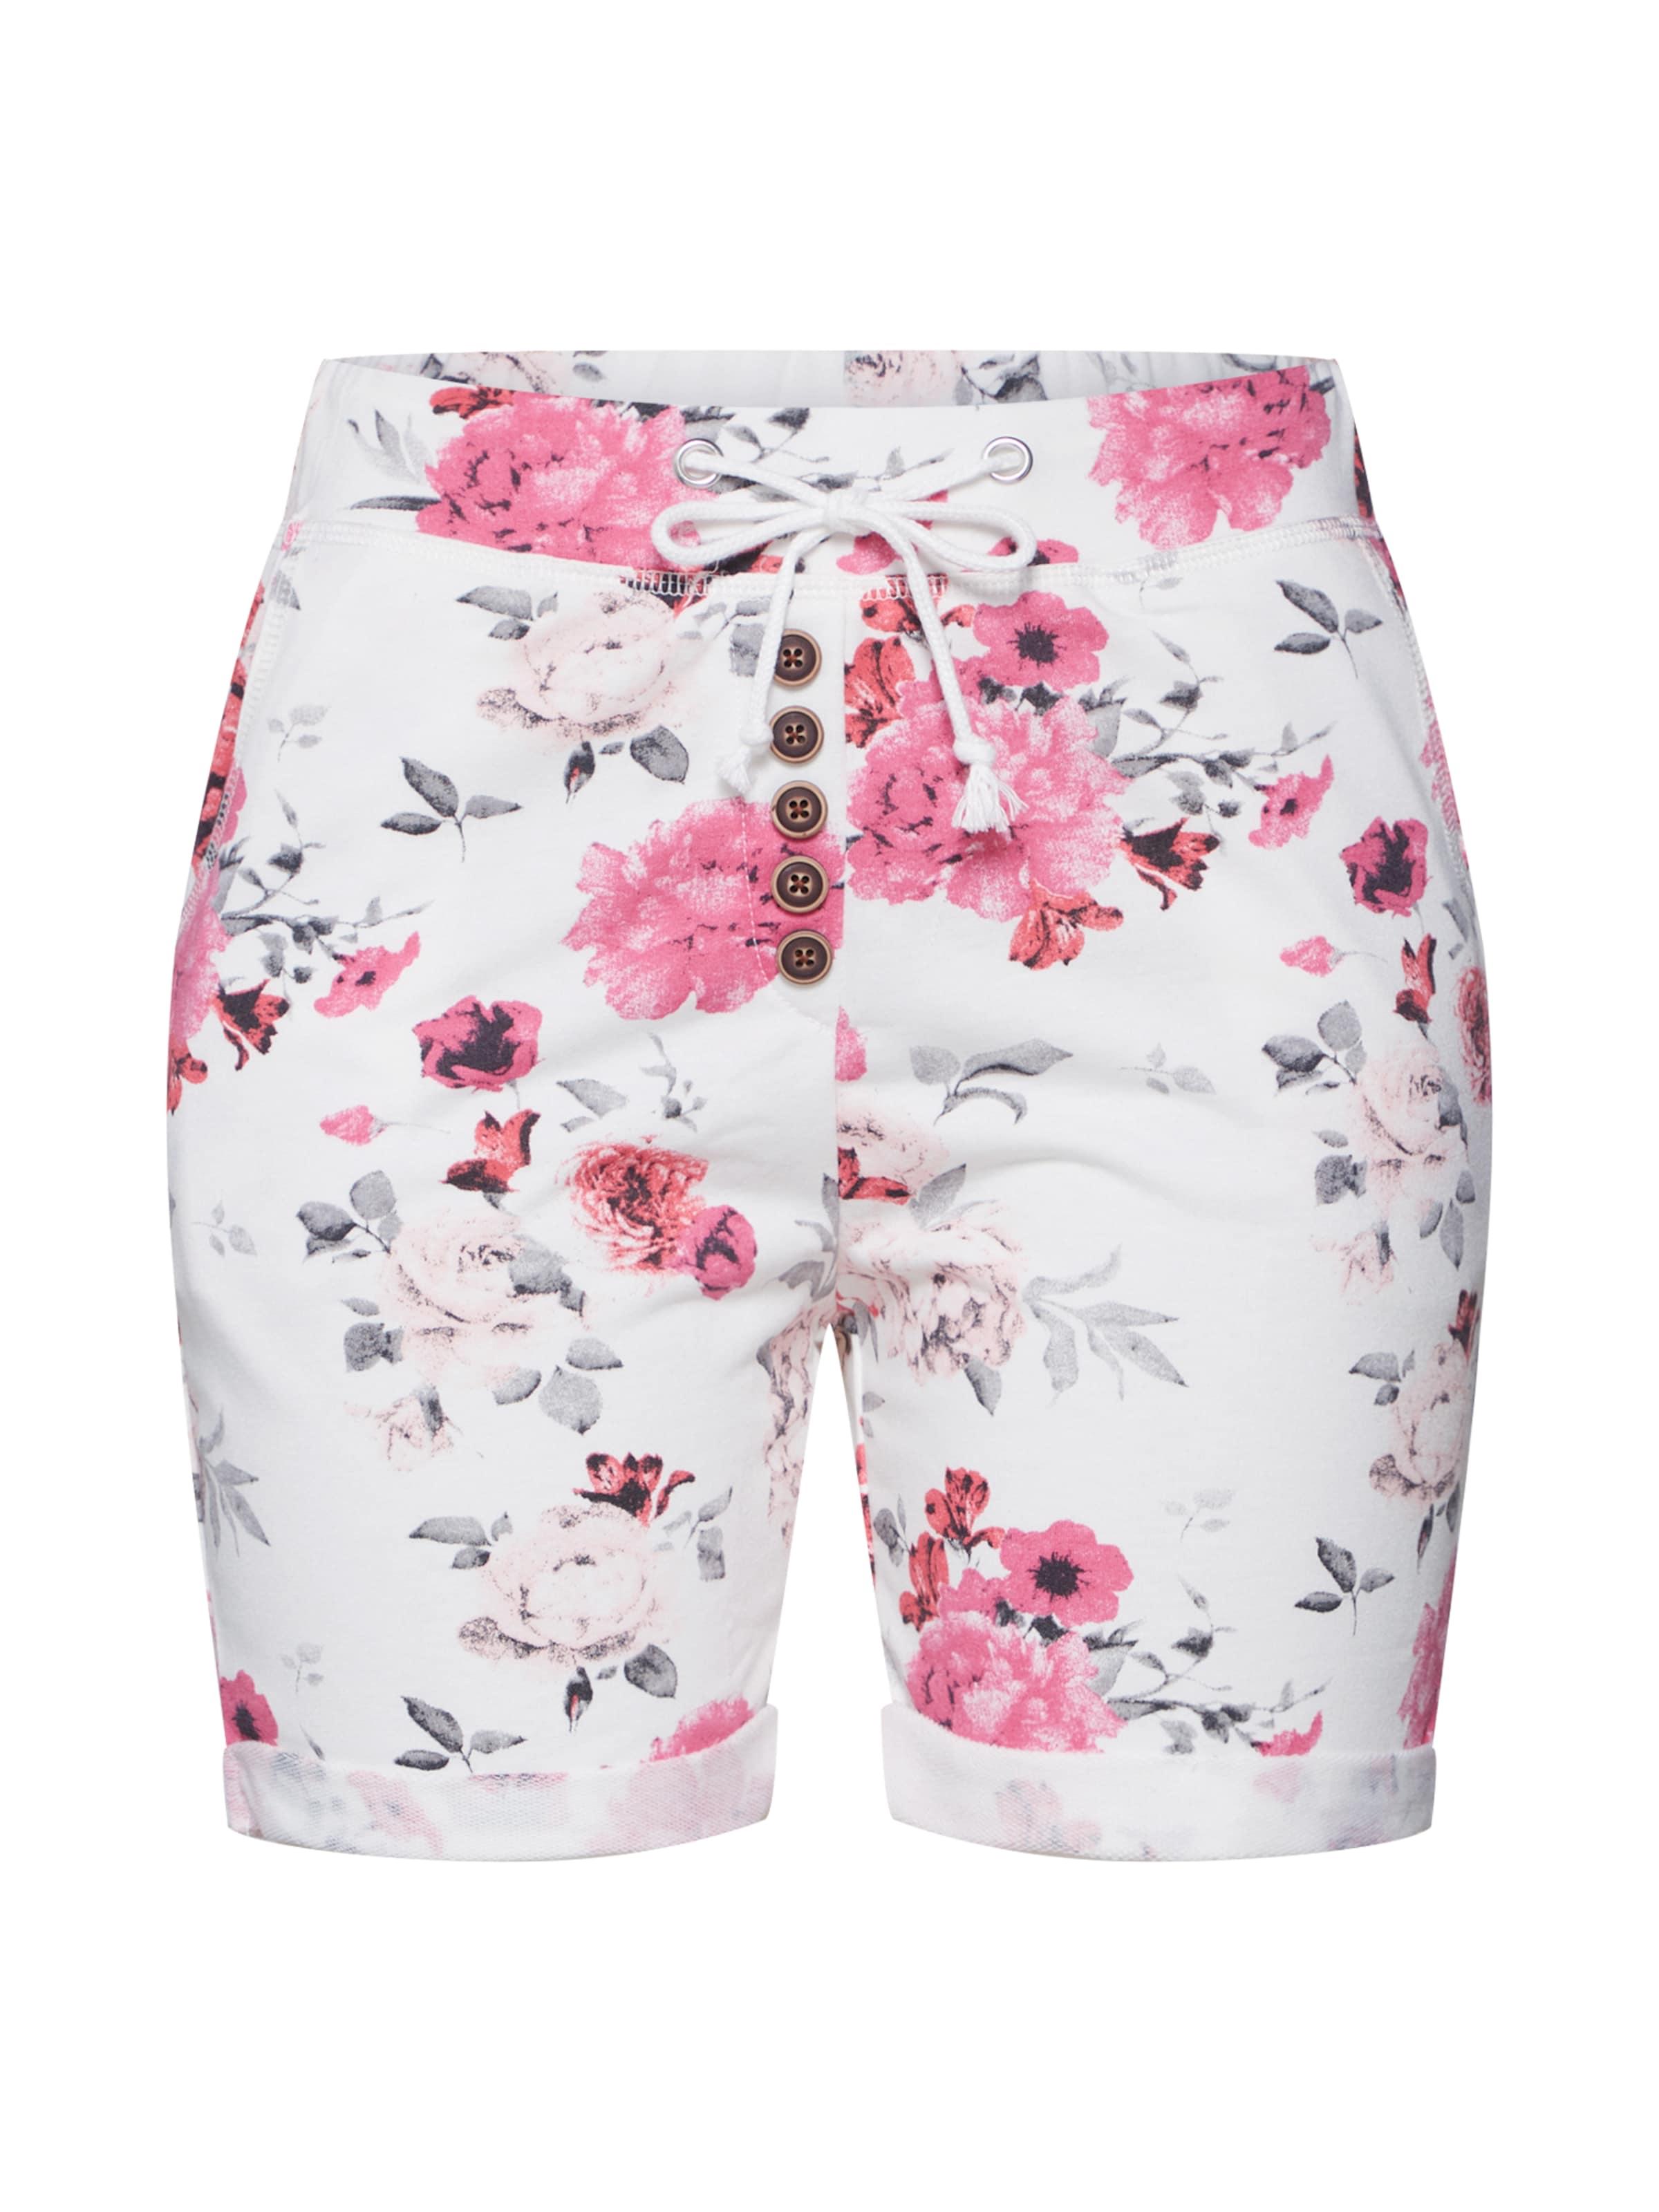 Hailys Shorts Shorts In 'sabina' MischfarbenWeiß 'sabina' Shorts Hailys Hailys MischfarbenWeiß In nw0Nmv8